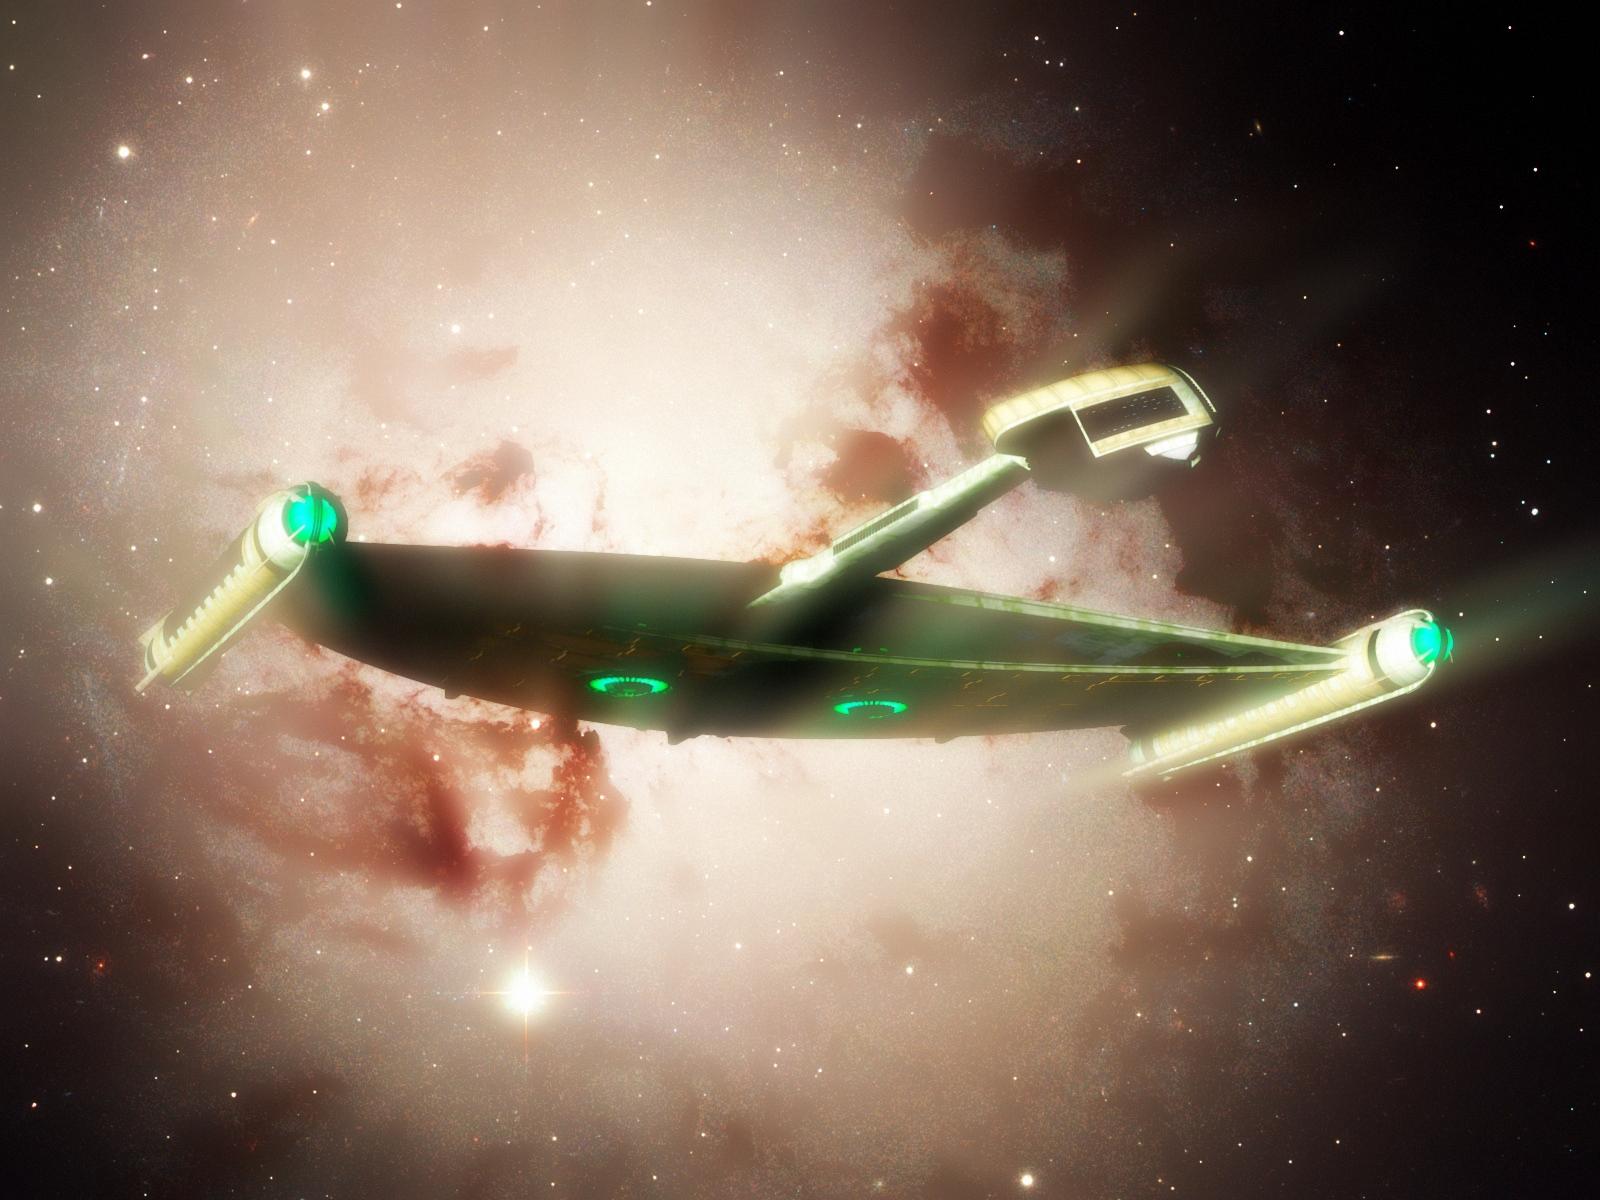 Madman's Romulan cruiser by davemetlesits